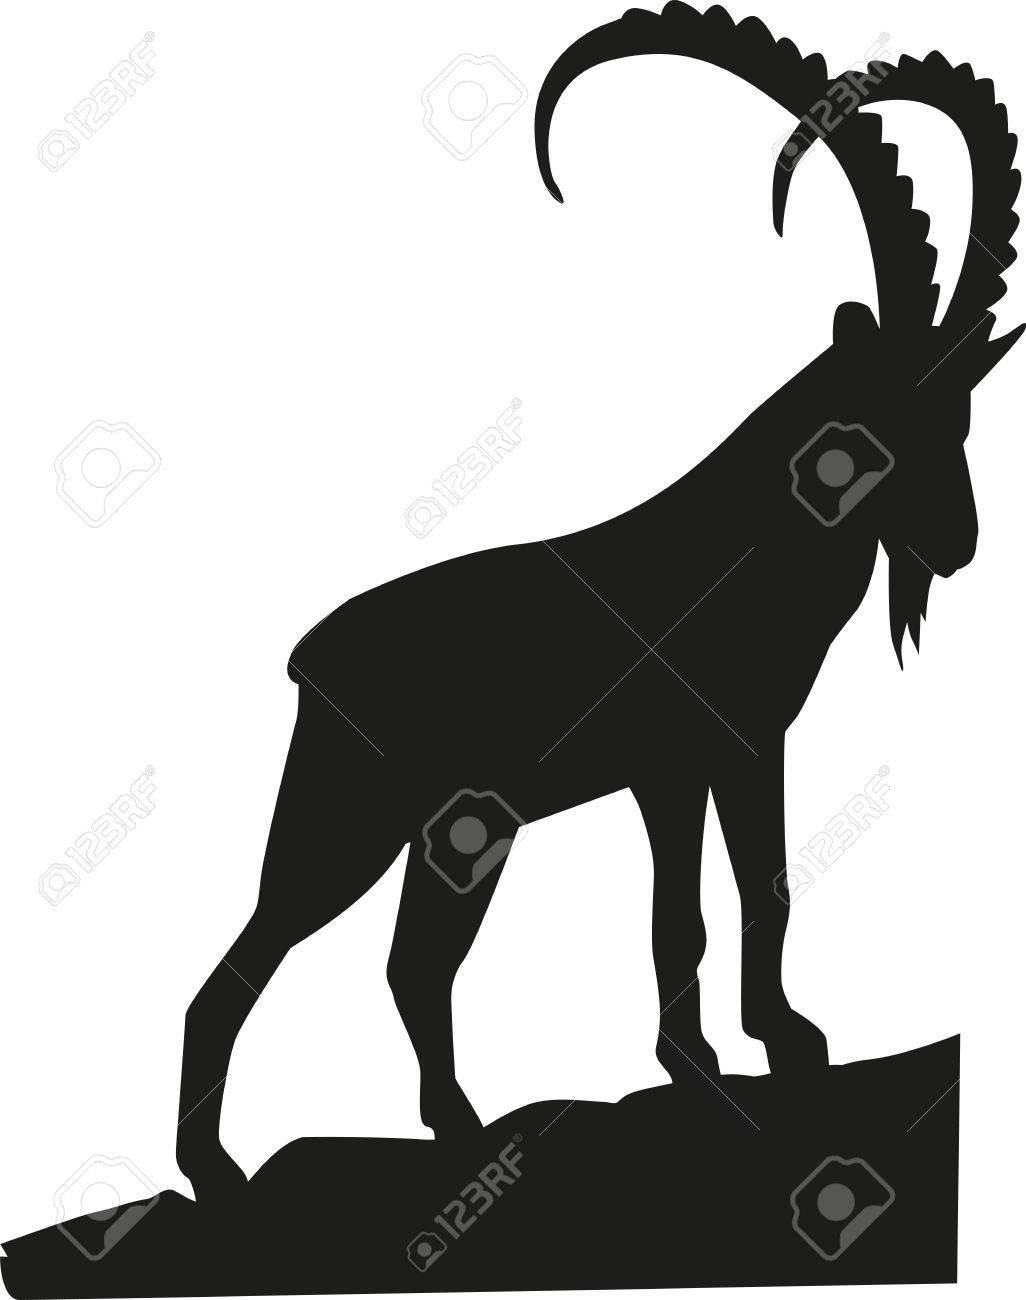 Ibex on the rock - 50323978